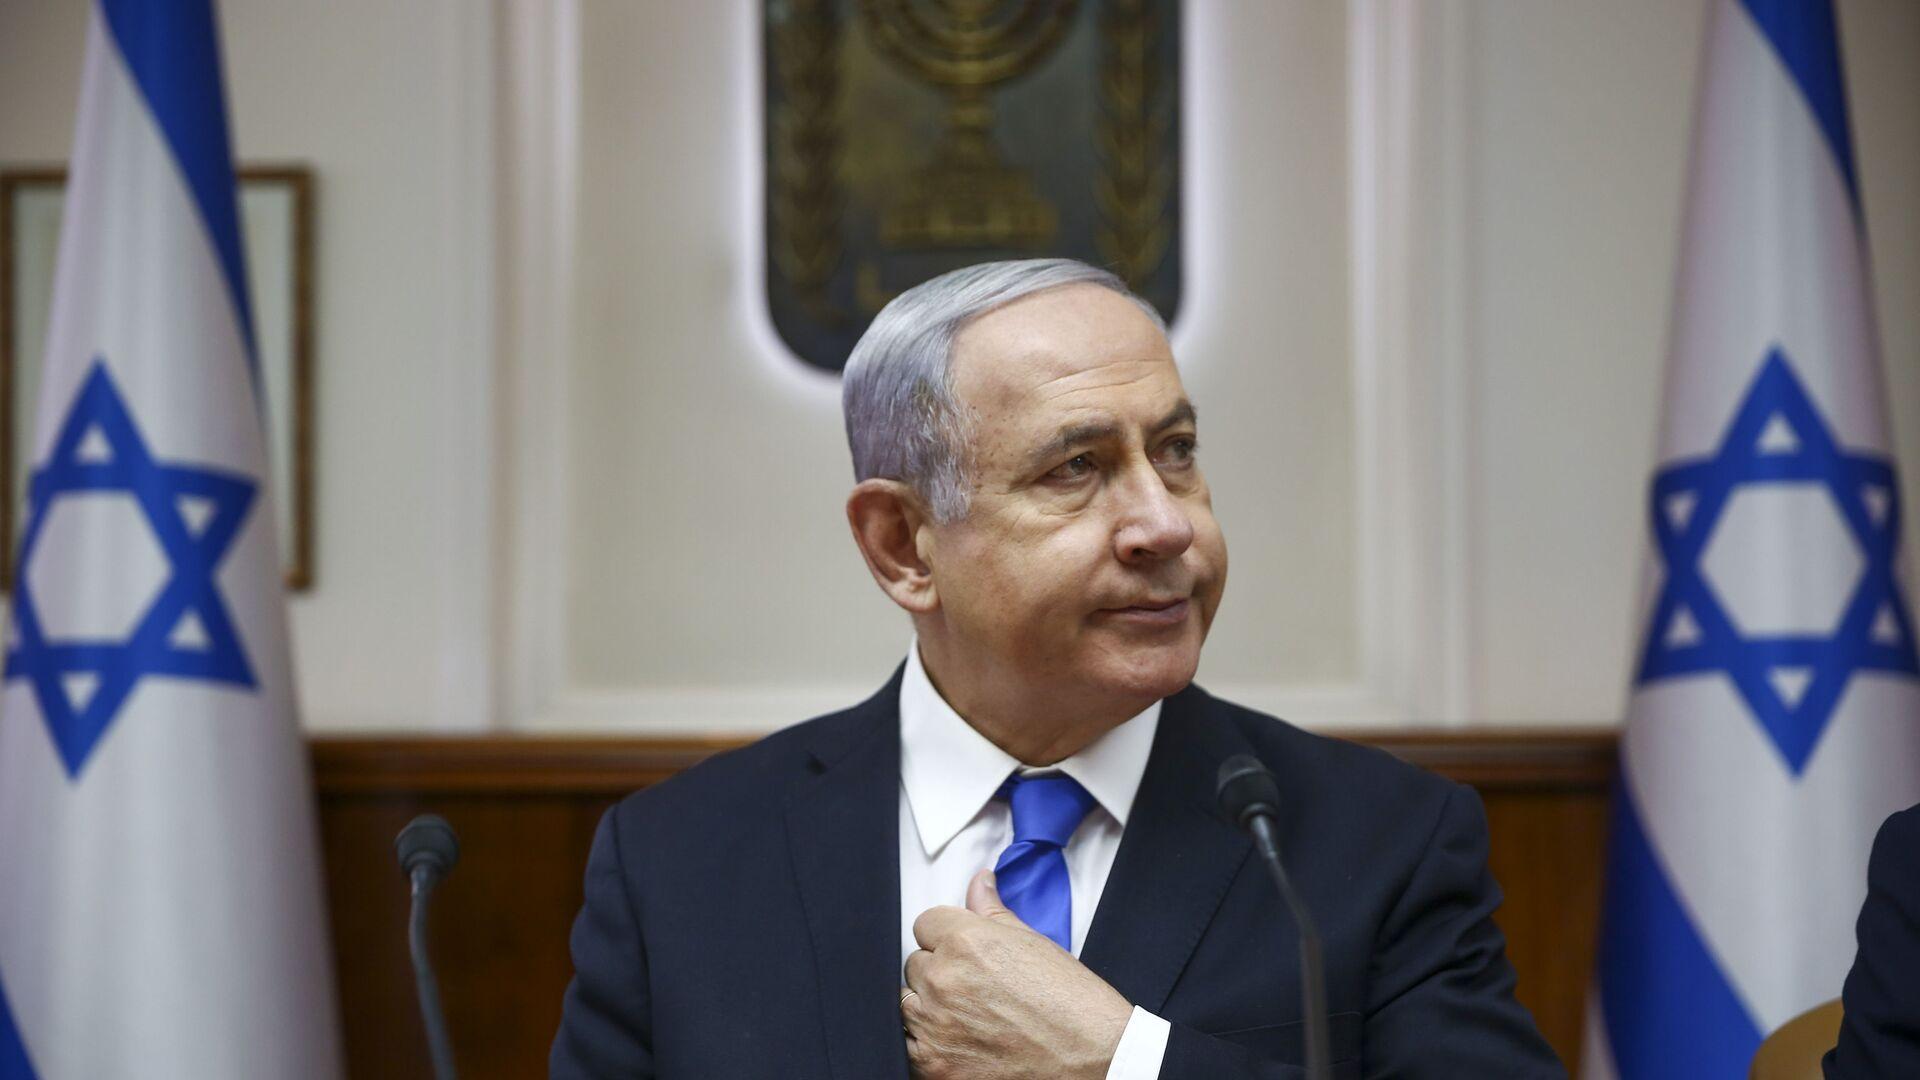 El primer ministro israelí, Benjamín Netanyahu - Sputnik Mundo, 1920, 07.06.2021